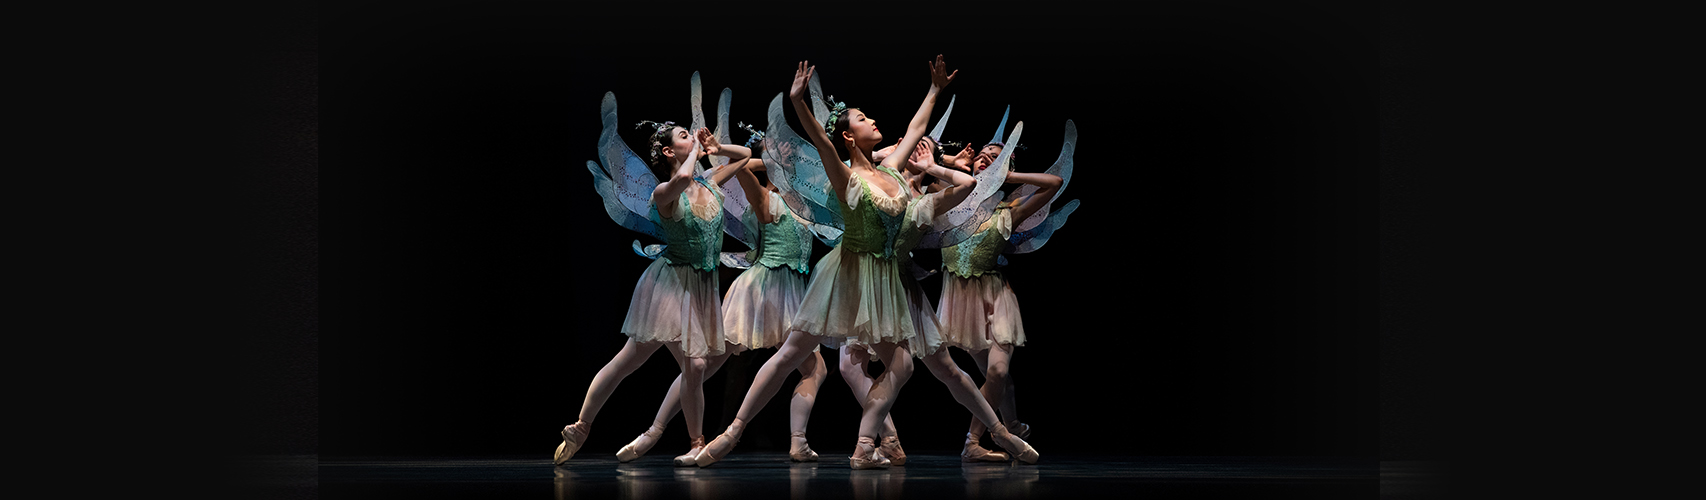 San Francisco Ballet in Balanchine's A Midsummer Night's Dream